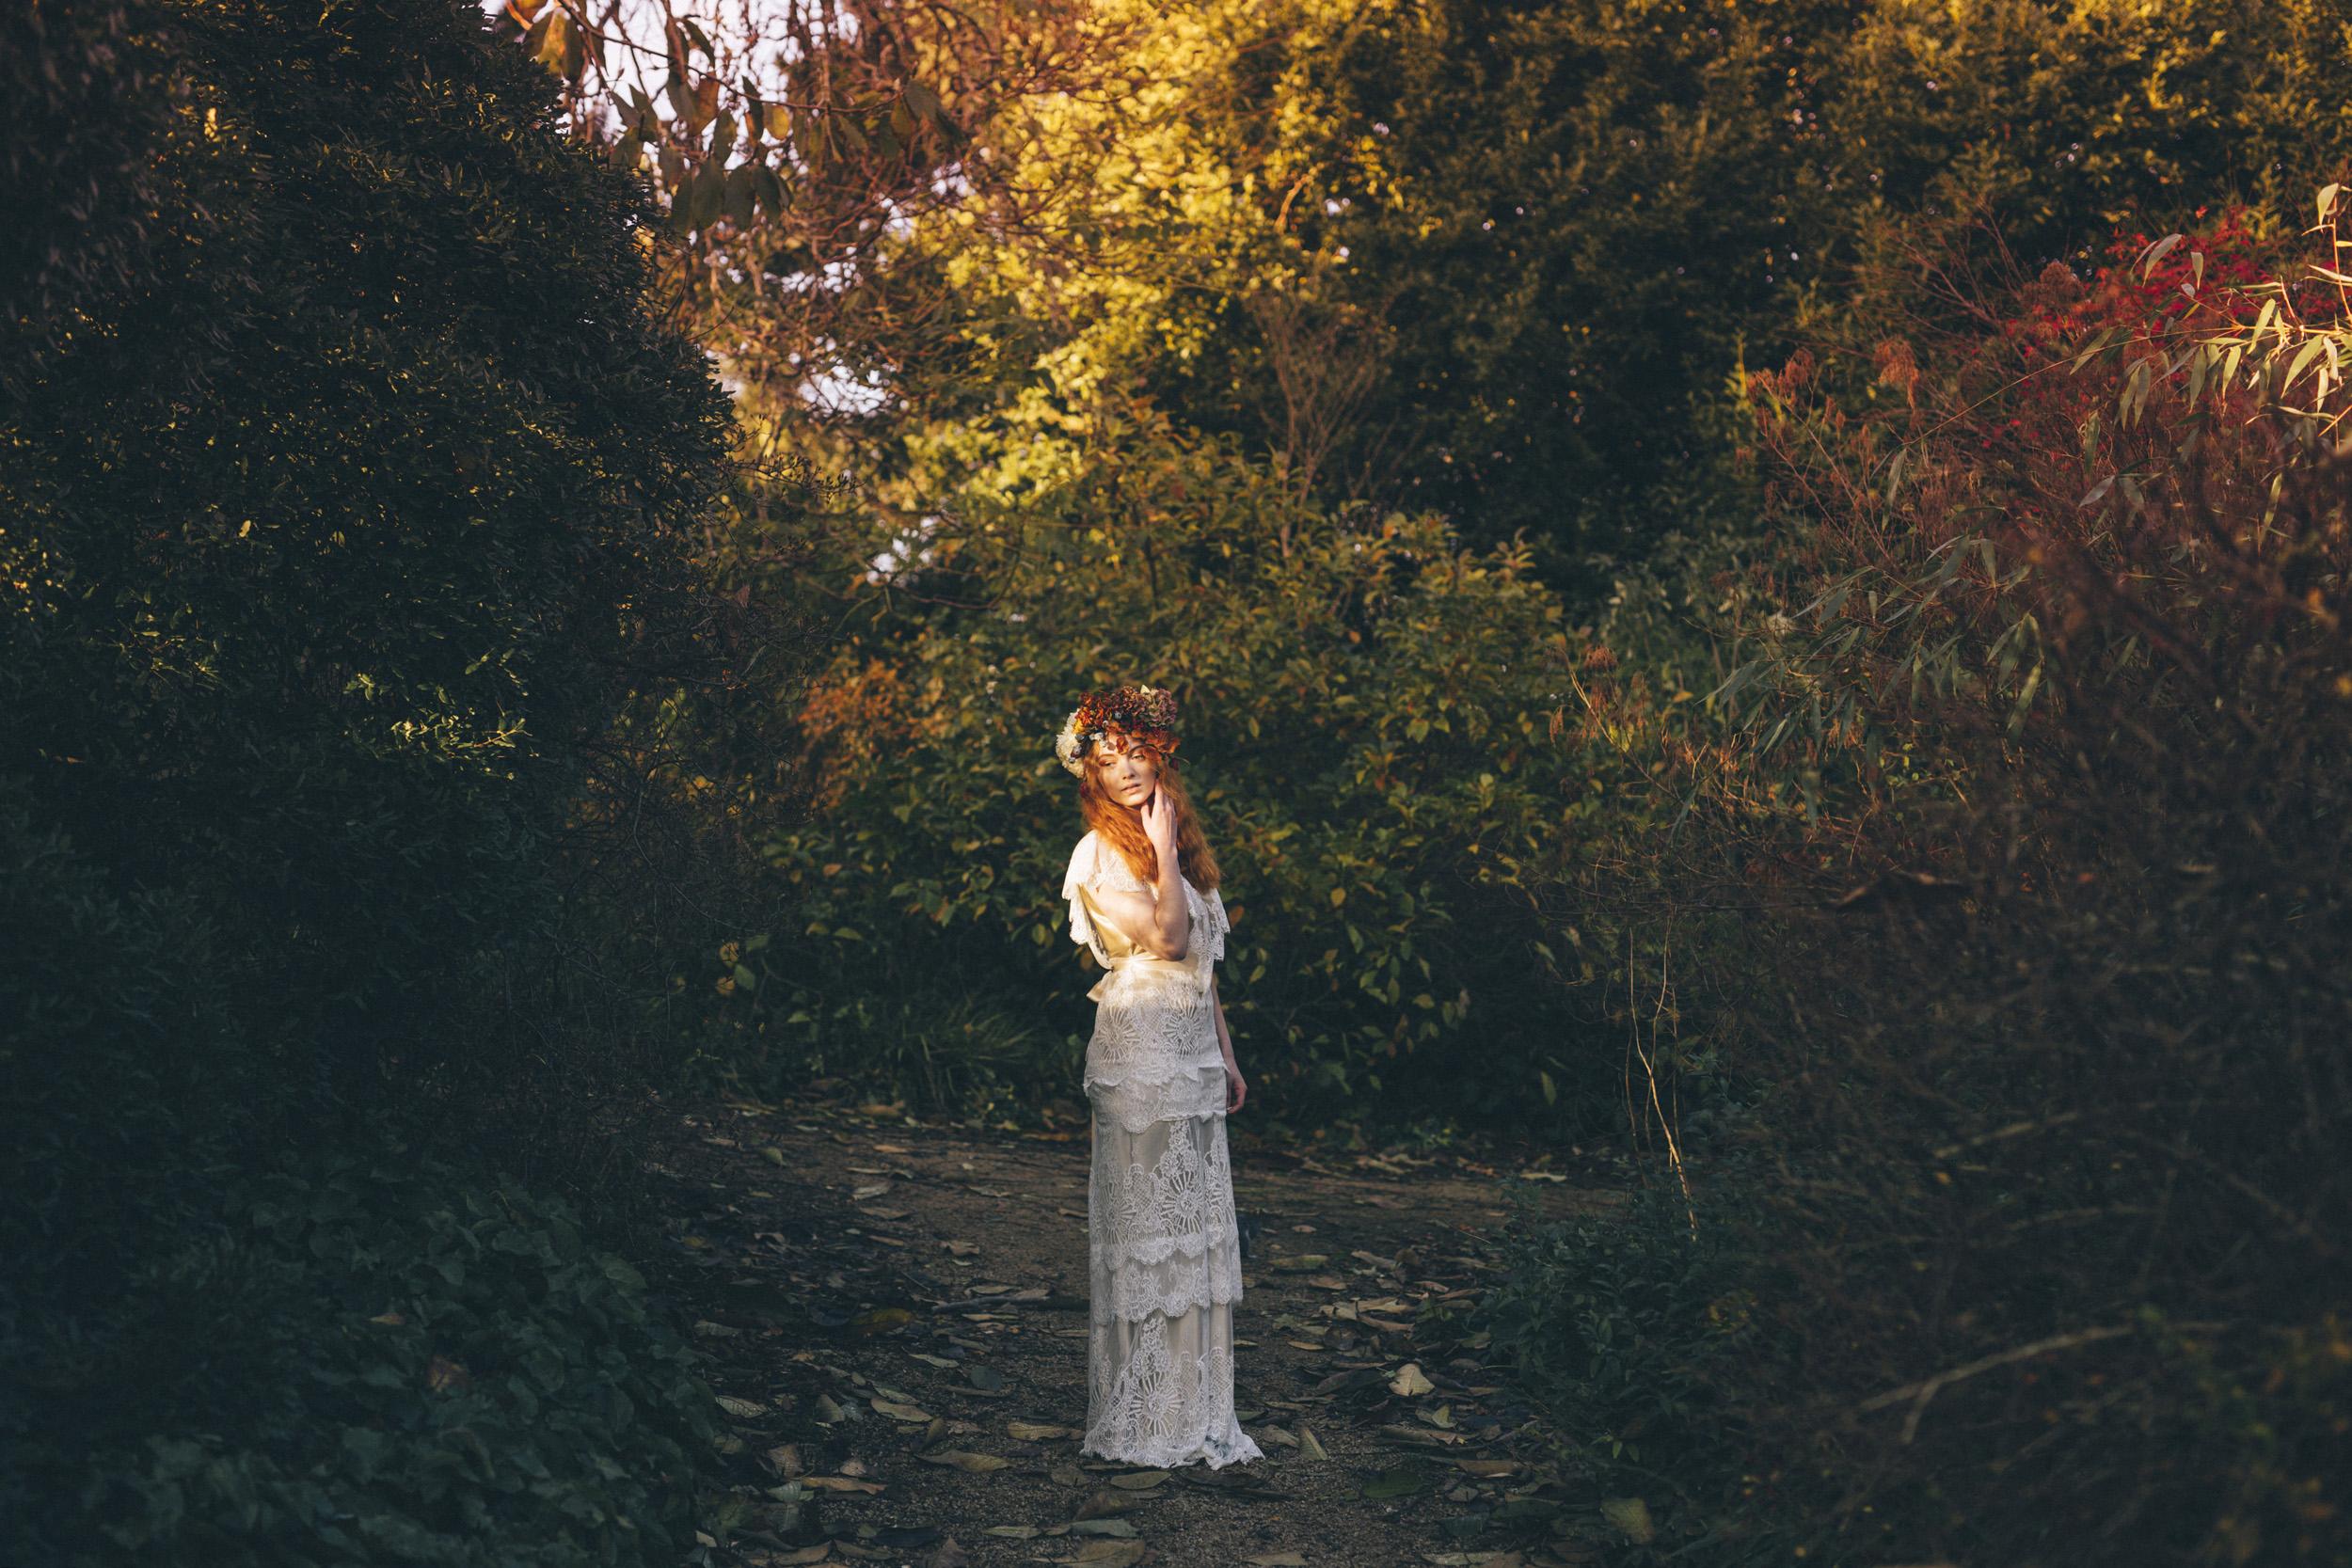 Autumn-Leaves-Shelley-Richmond-Kate-Beaumont-Sheffield-10.jpg